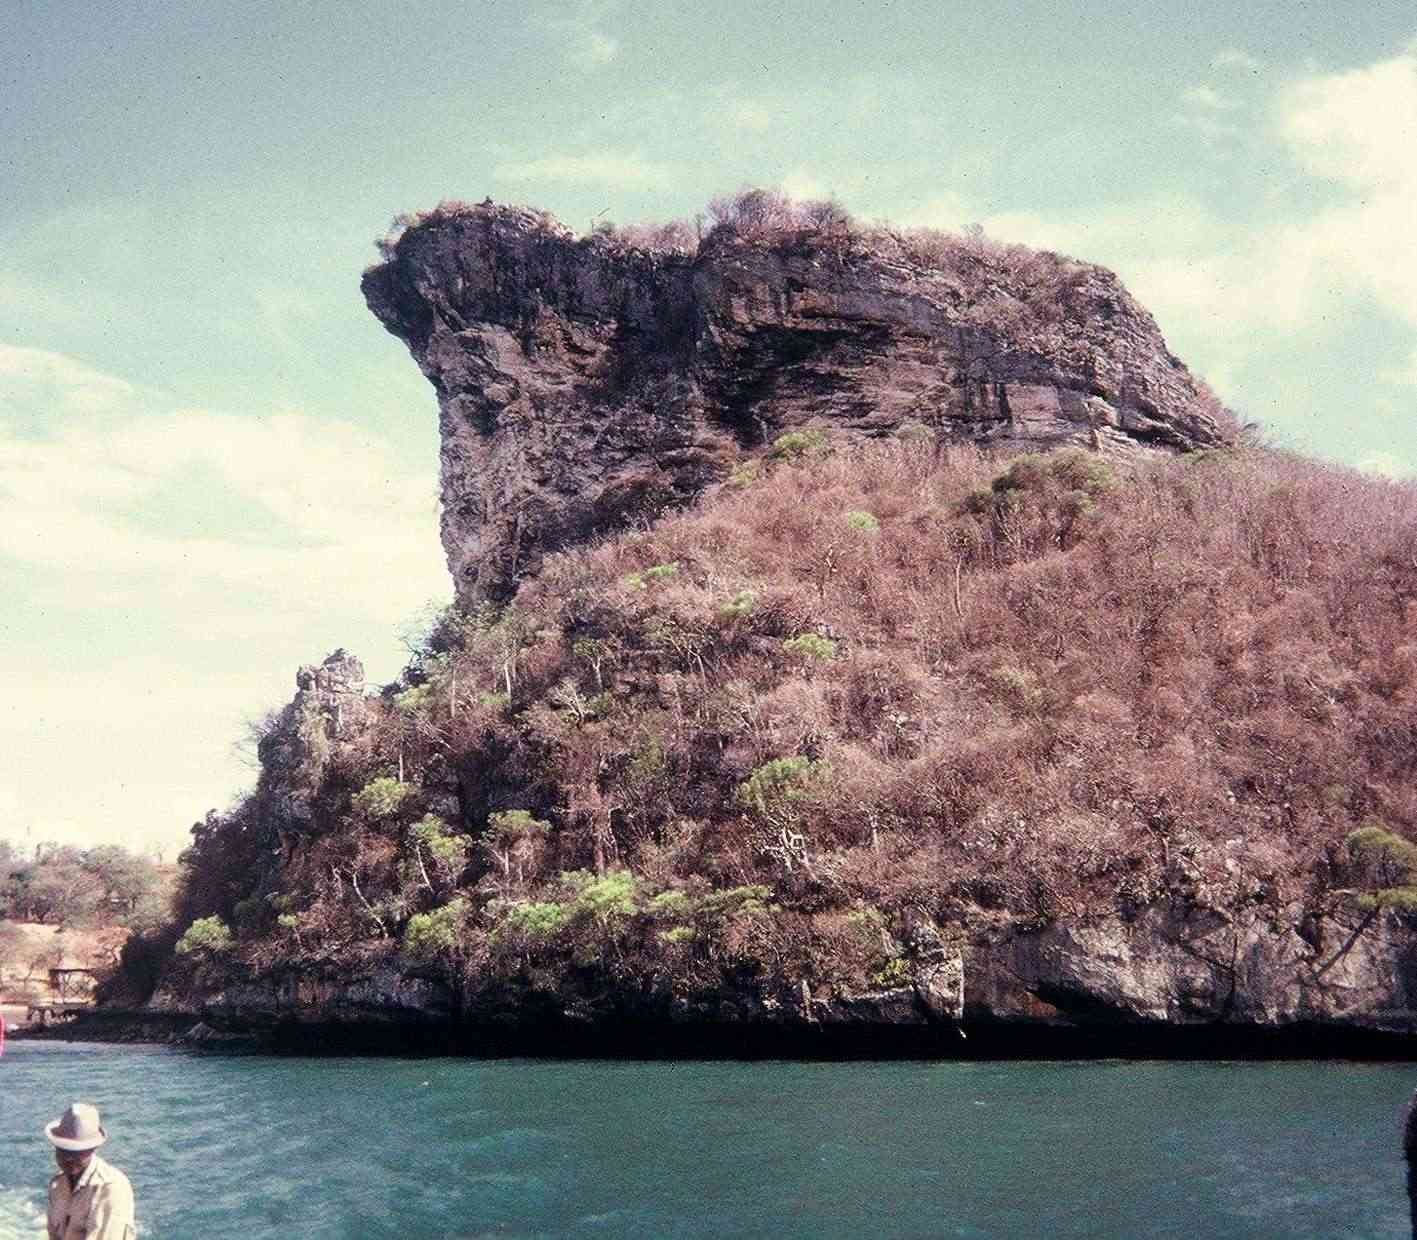 [Divers campagne Madagascar] CAP DIEGO AU CID 1972 - Page 2 Cd1_pa19